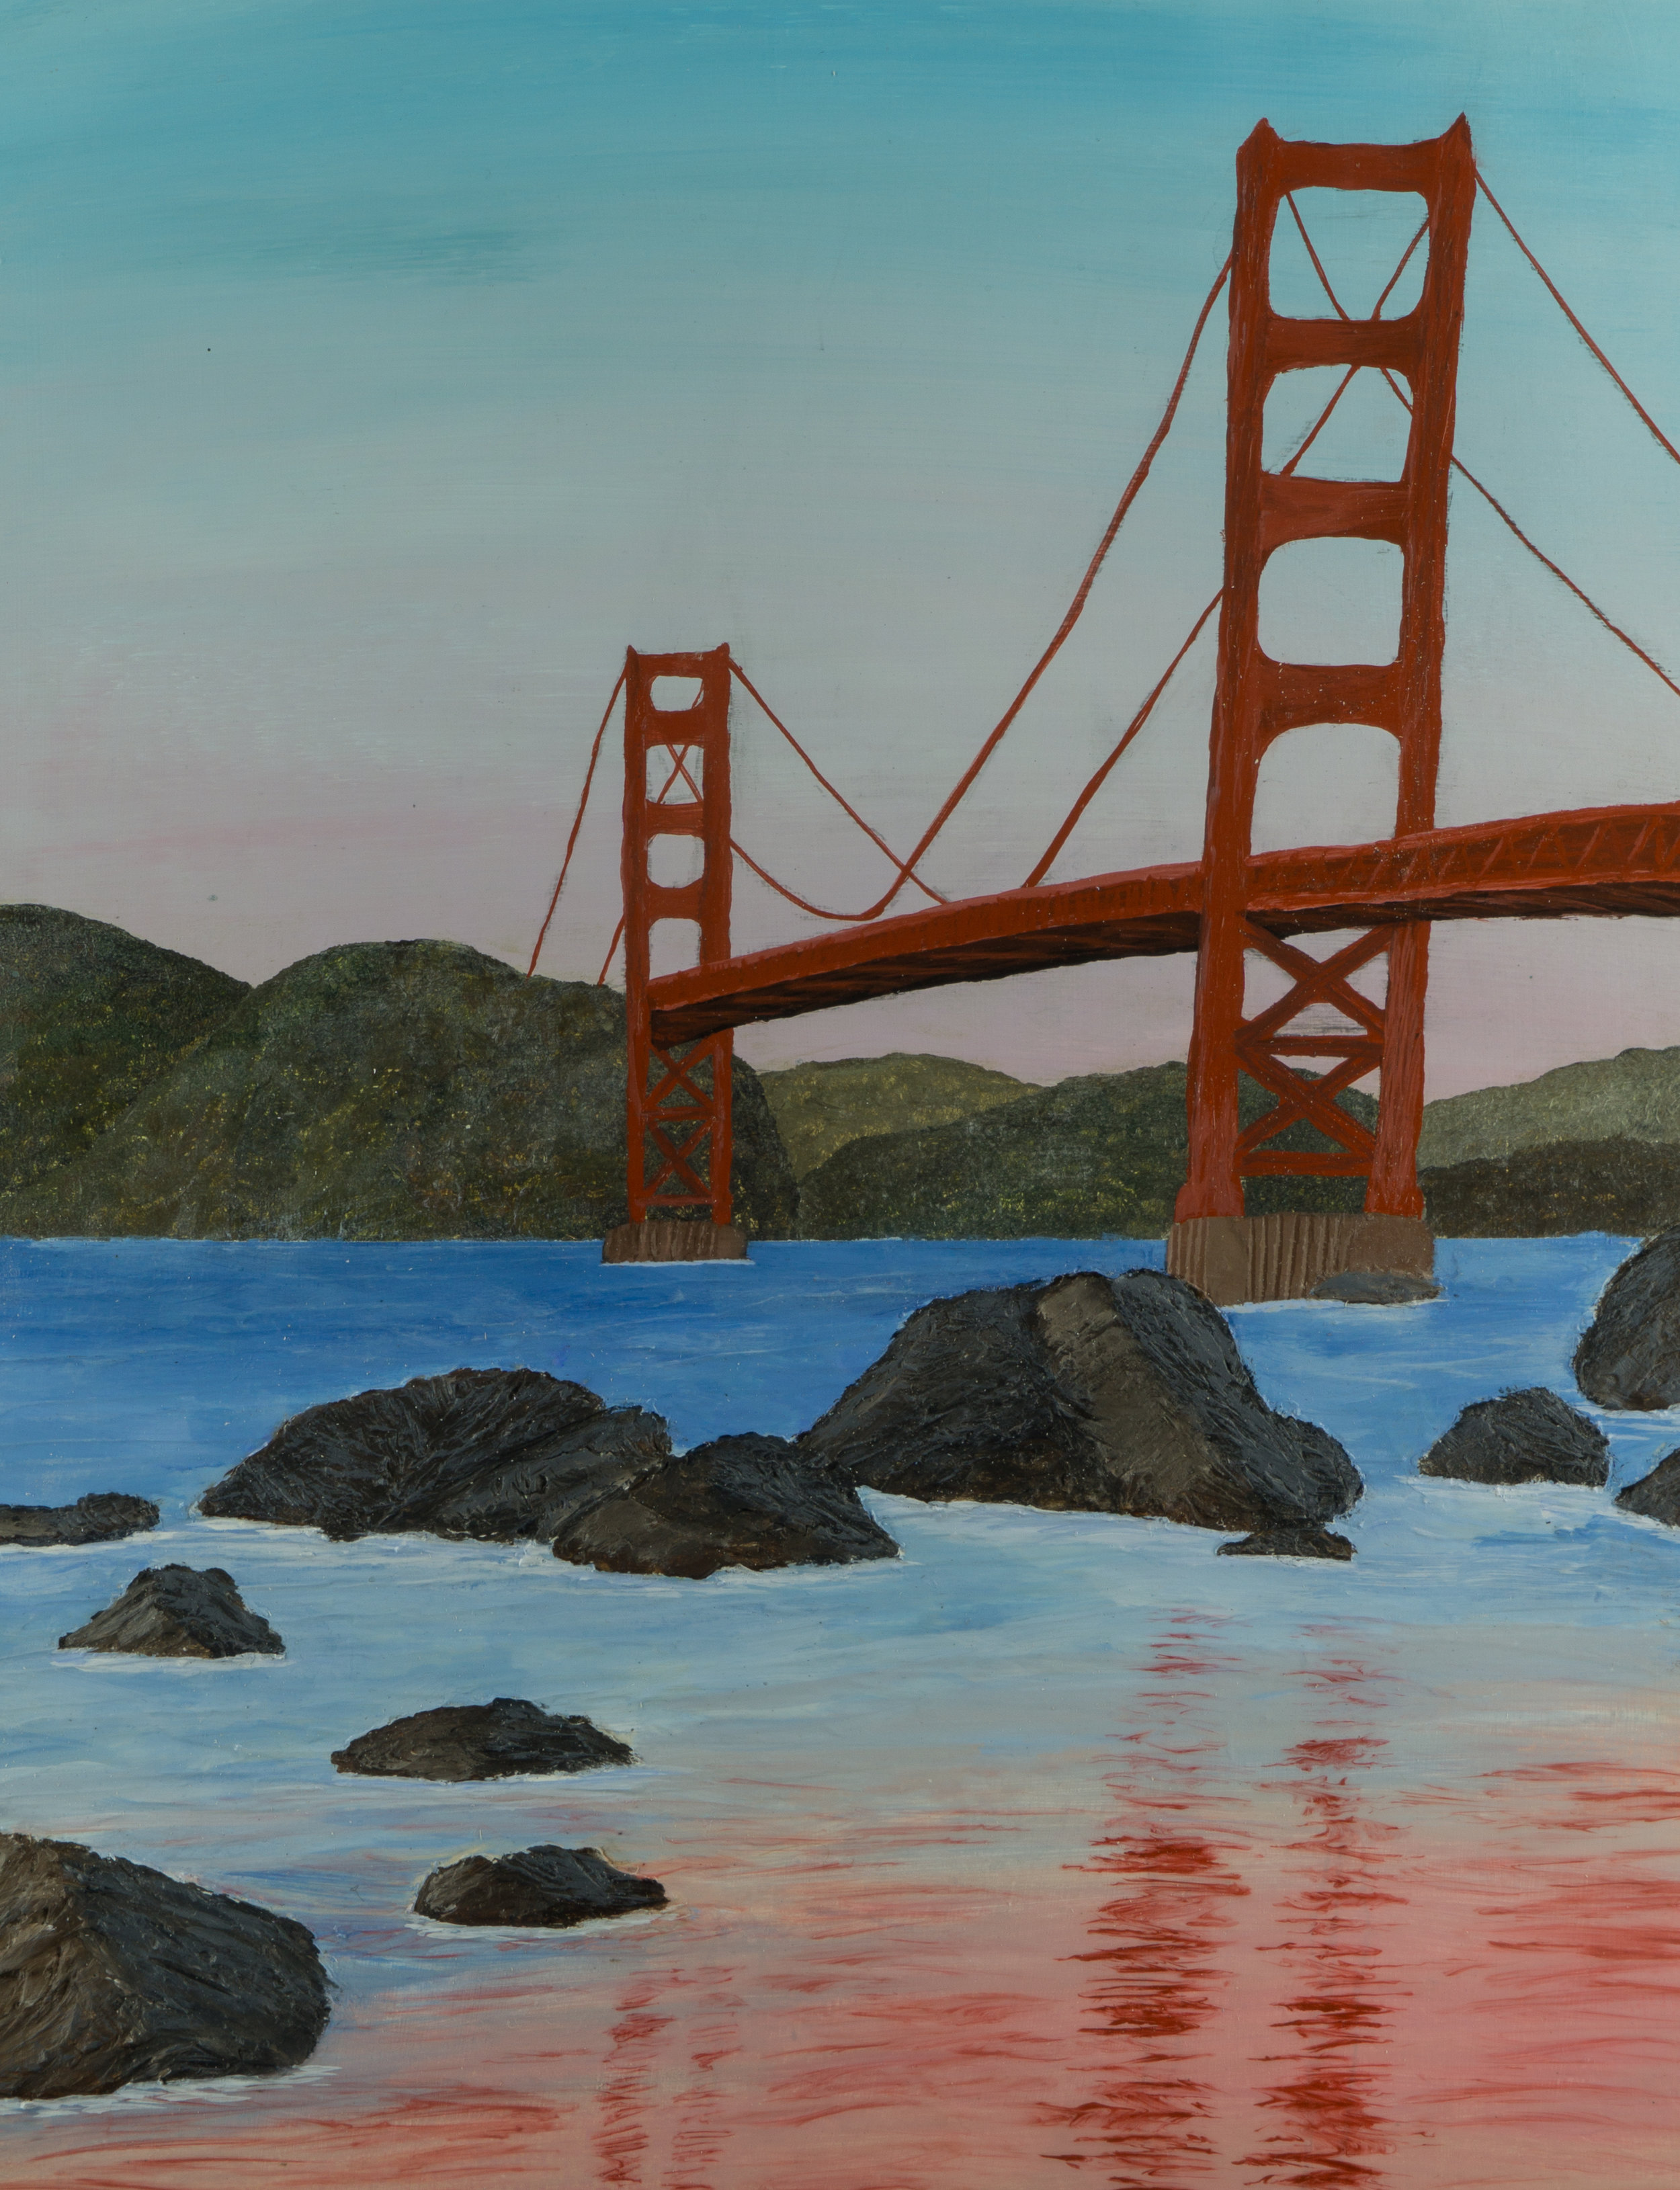 16x12 Acrylic On Panel: Golden Gate Bridge